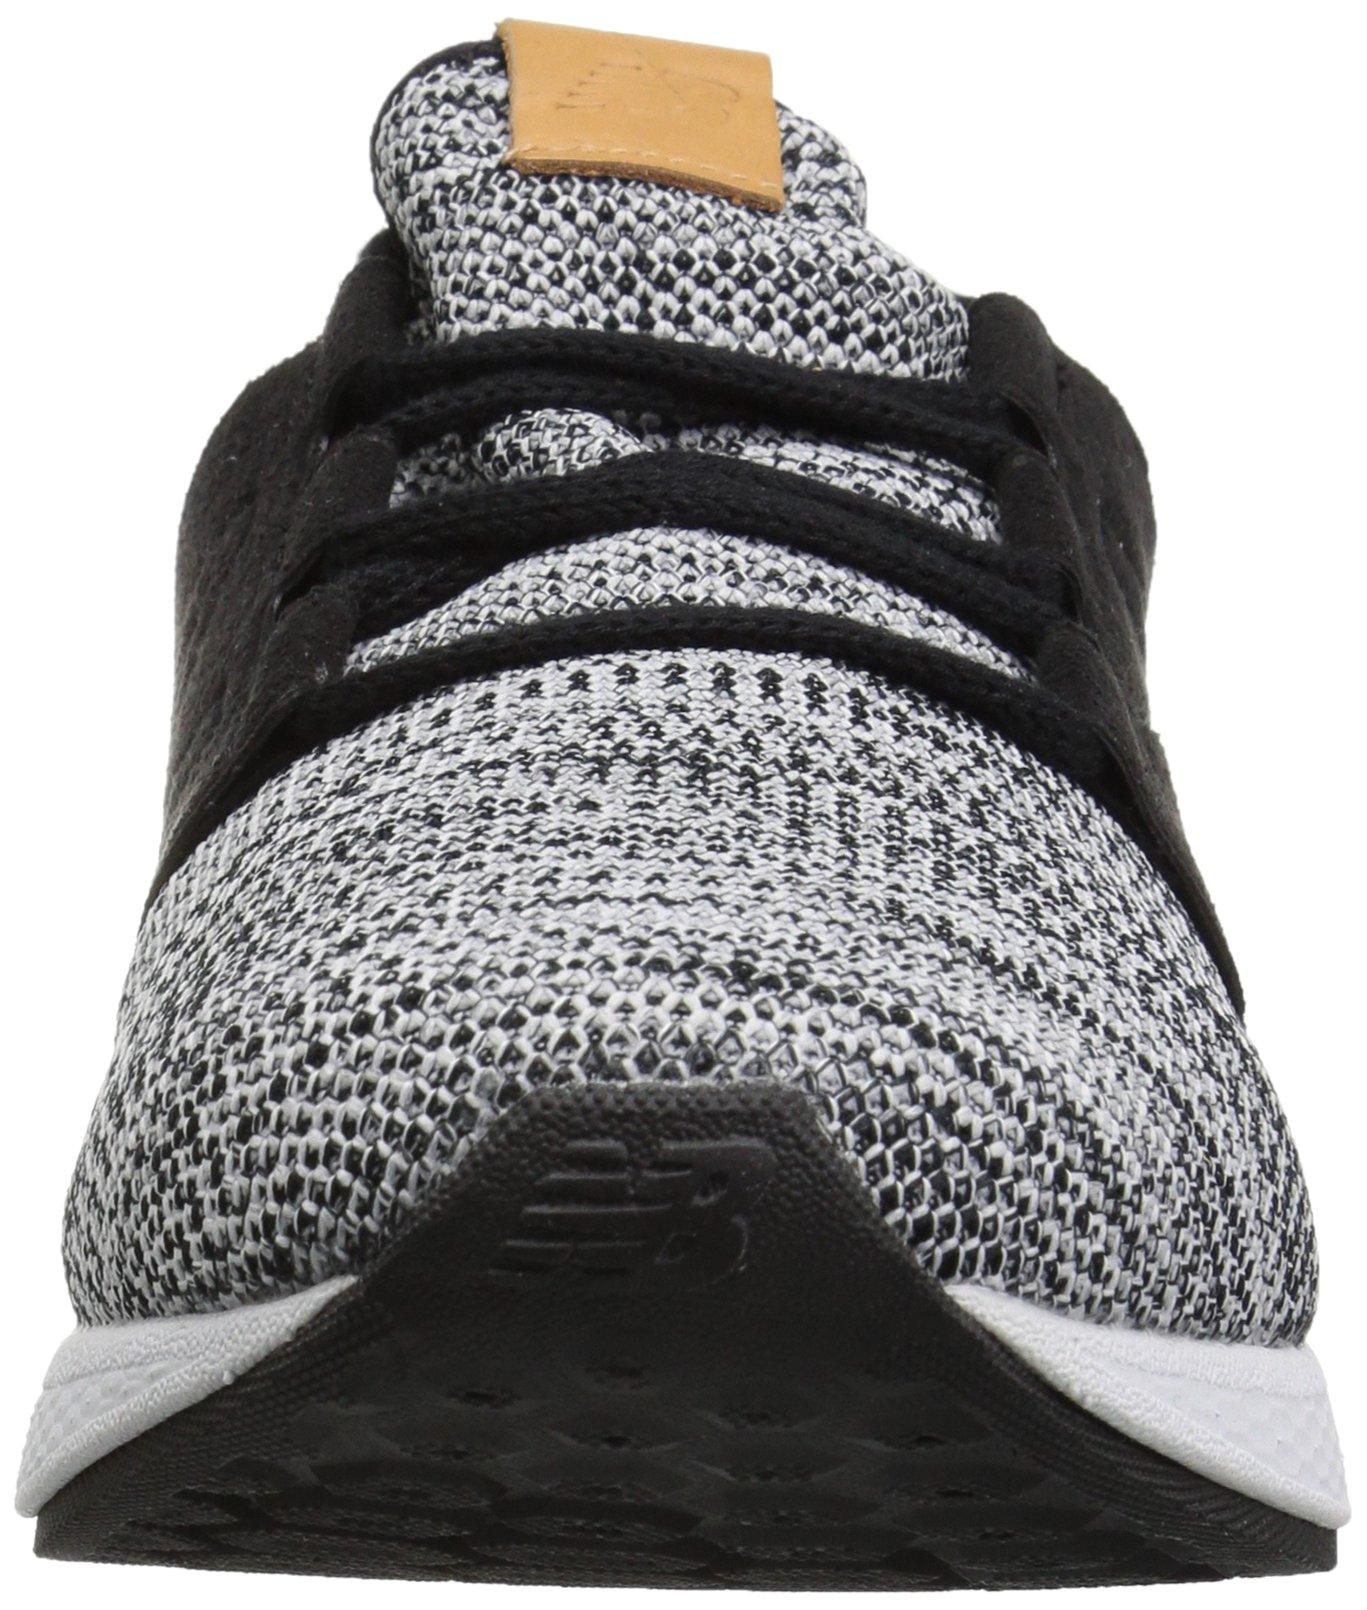 New Balance Men's Cruz V2 Fresh Foam Running Shoe, white/black, 7 D US by New Balance (Image #4)